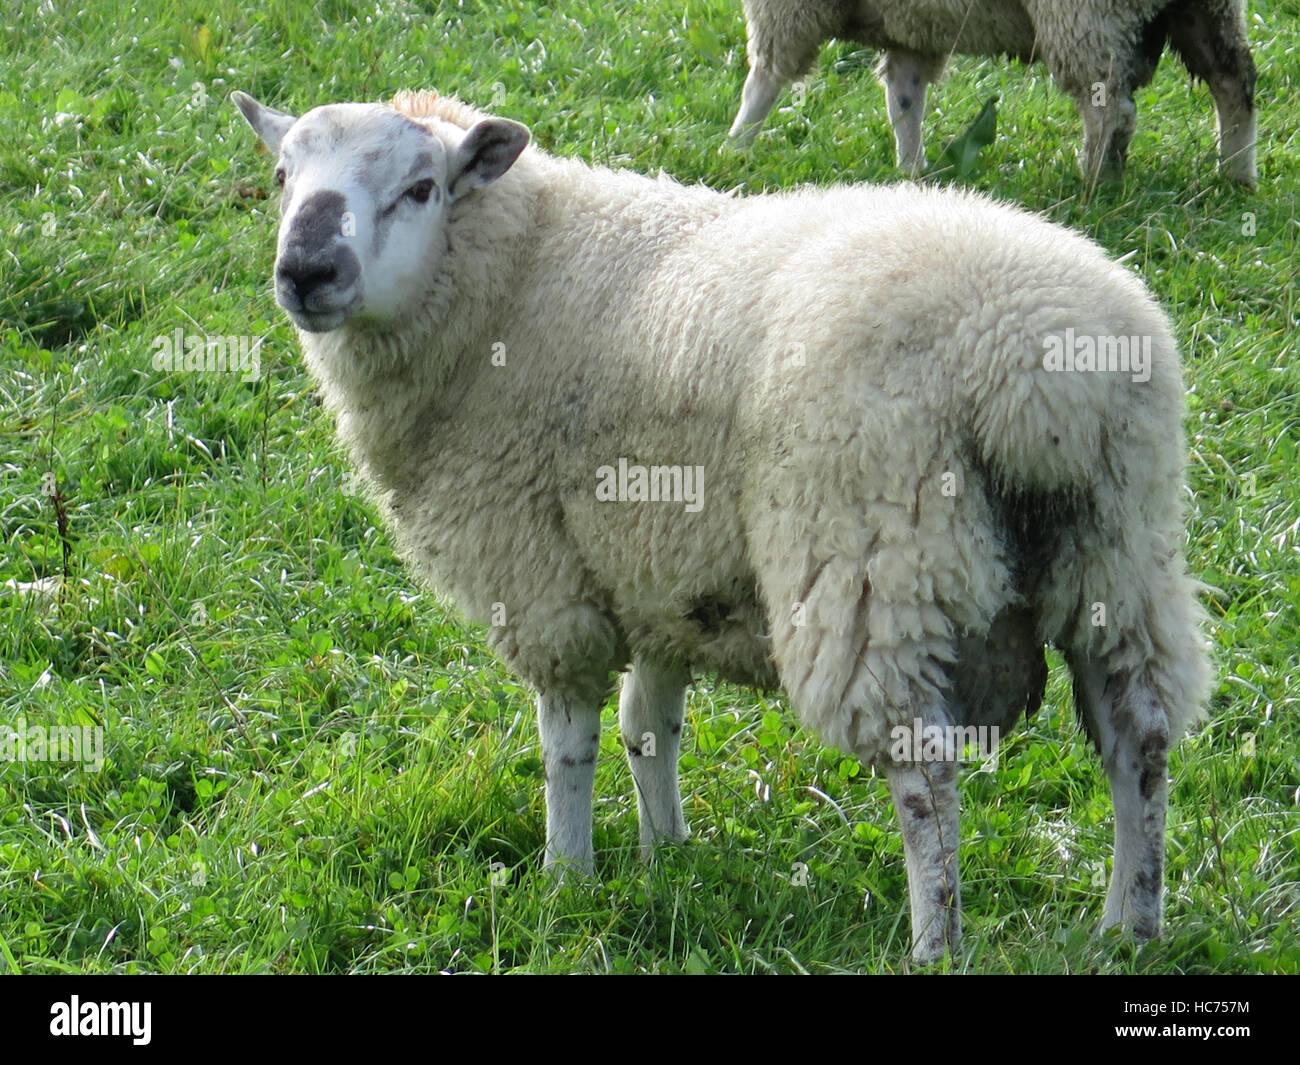 Sheep grazing in lush green farm land on sunny autumn day in Dorset, UK - Stock Image